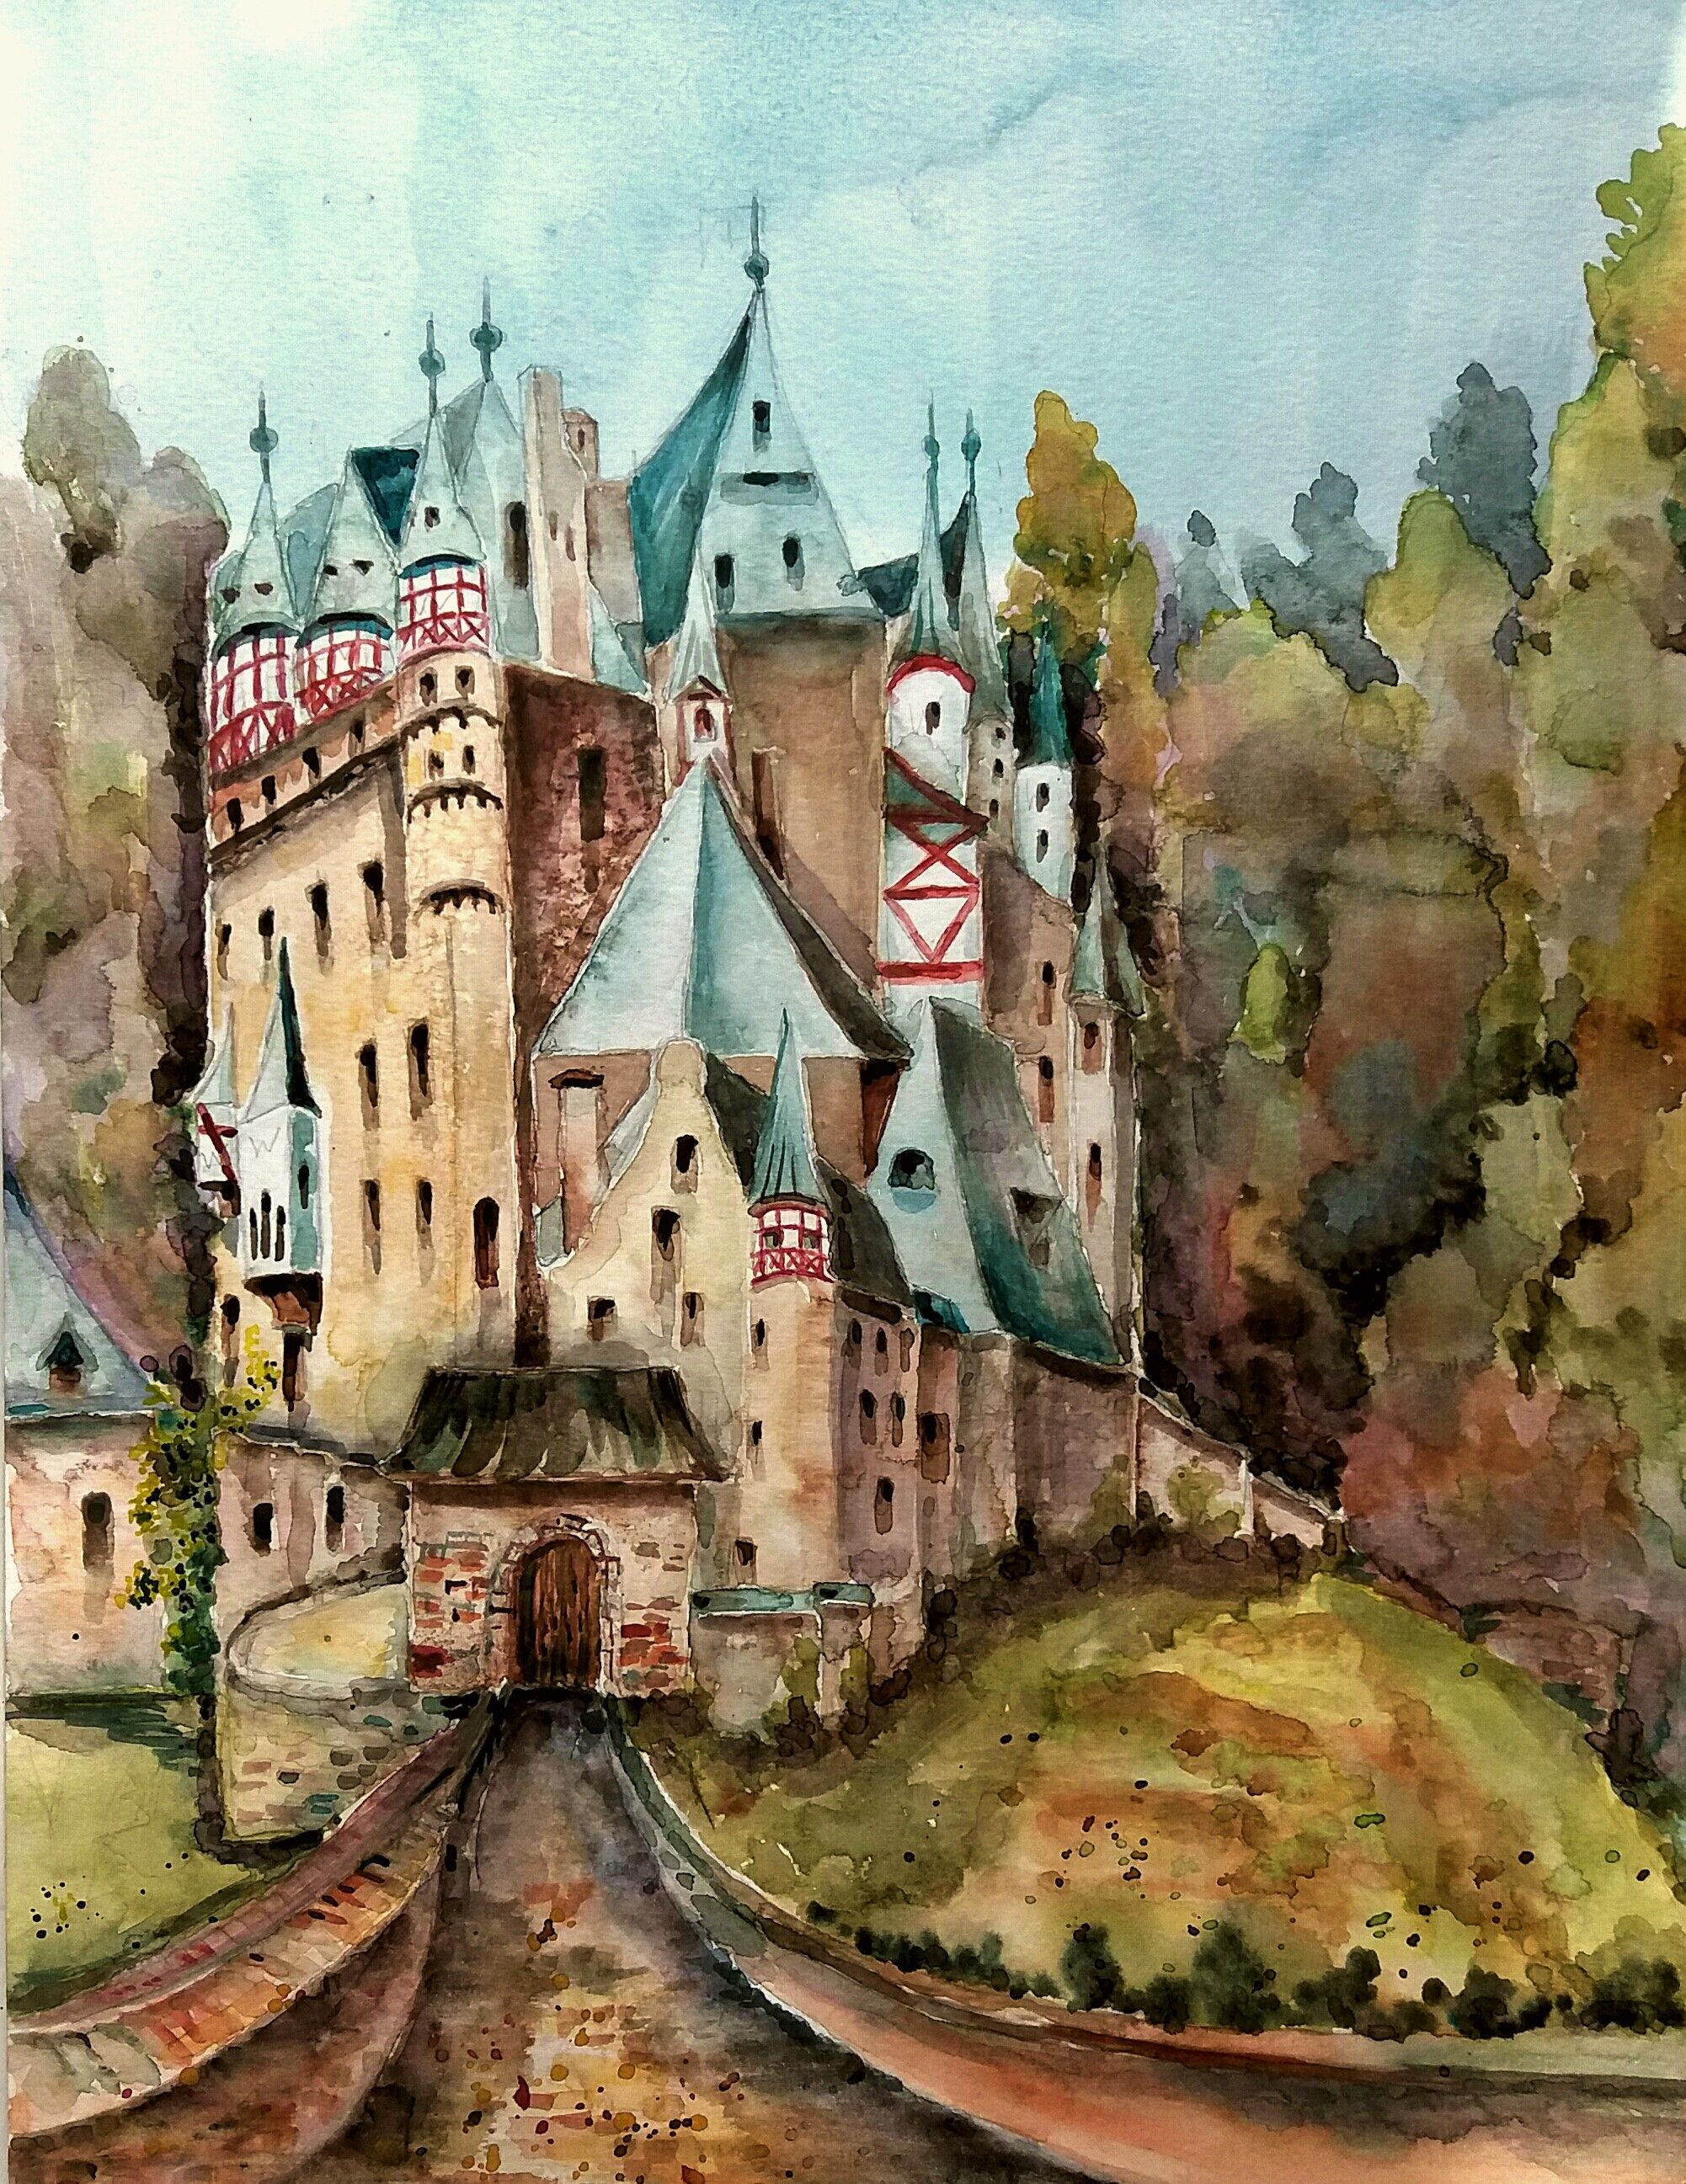 Burg Eltz Aquarell Burg Aquarell Zeichnung